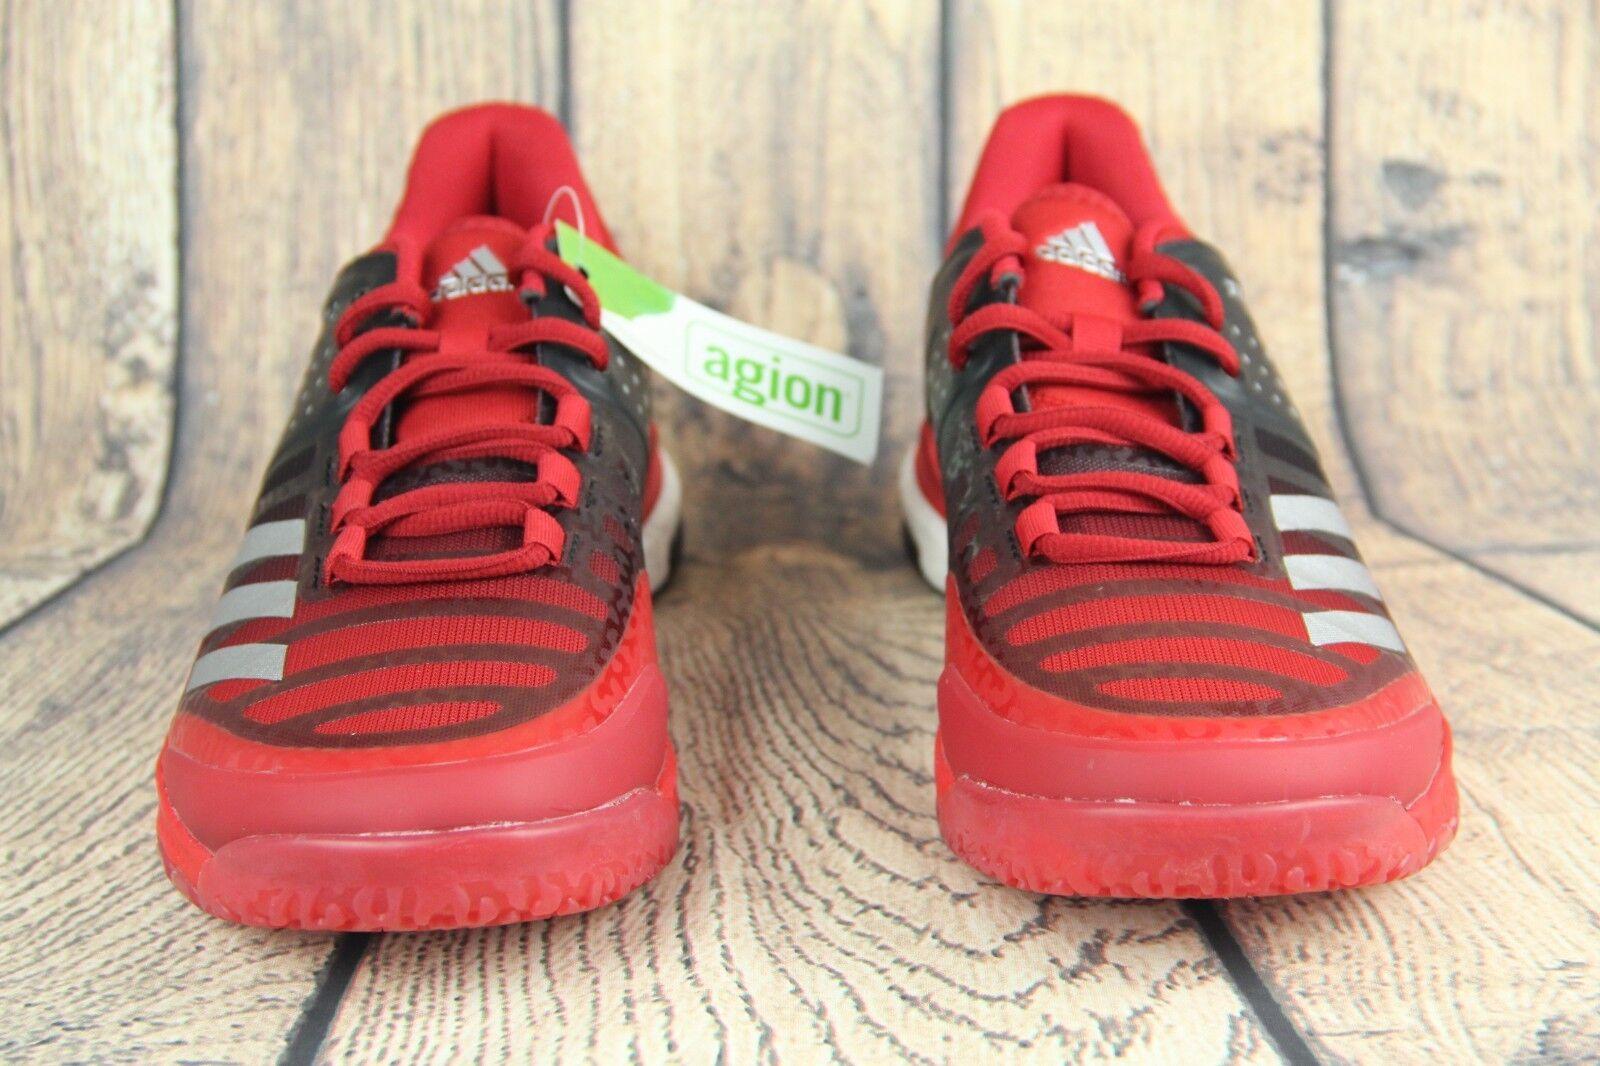 New Adidas Adidas Adidas Crazyflight X Women's Volleyball shoes Red Black BA9270 SZ RARE 9aaf3b